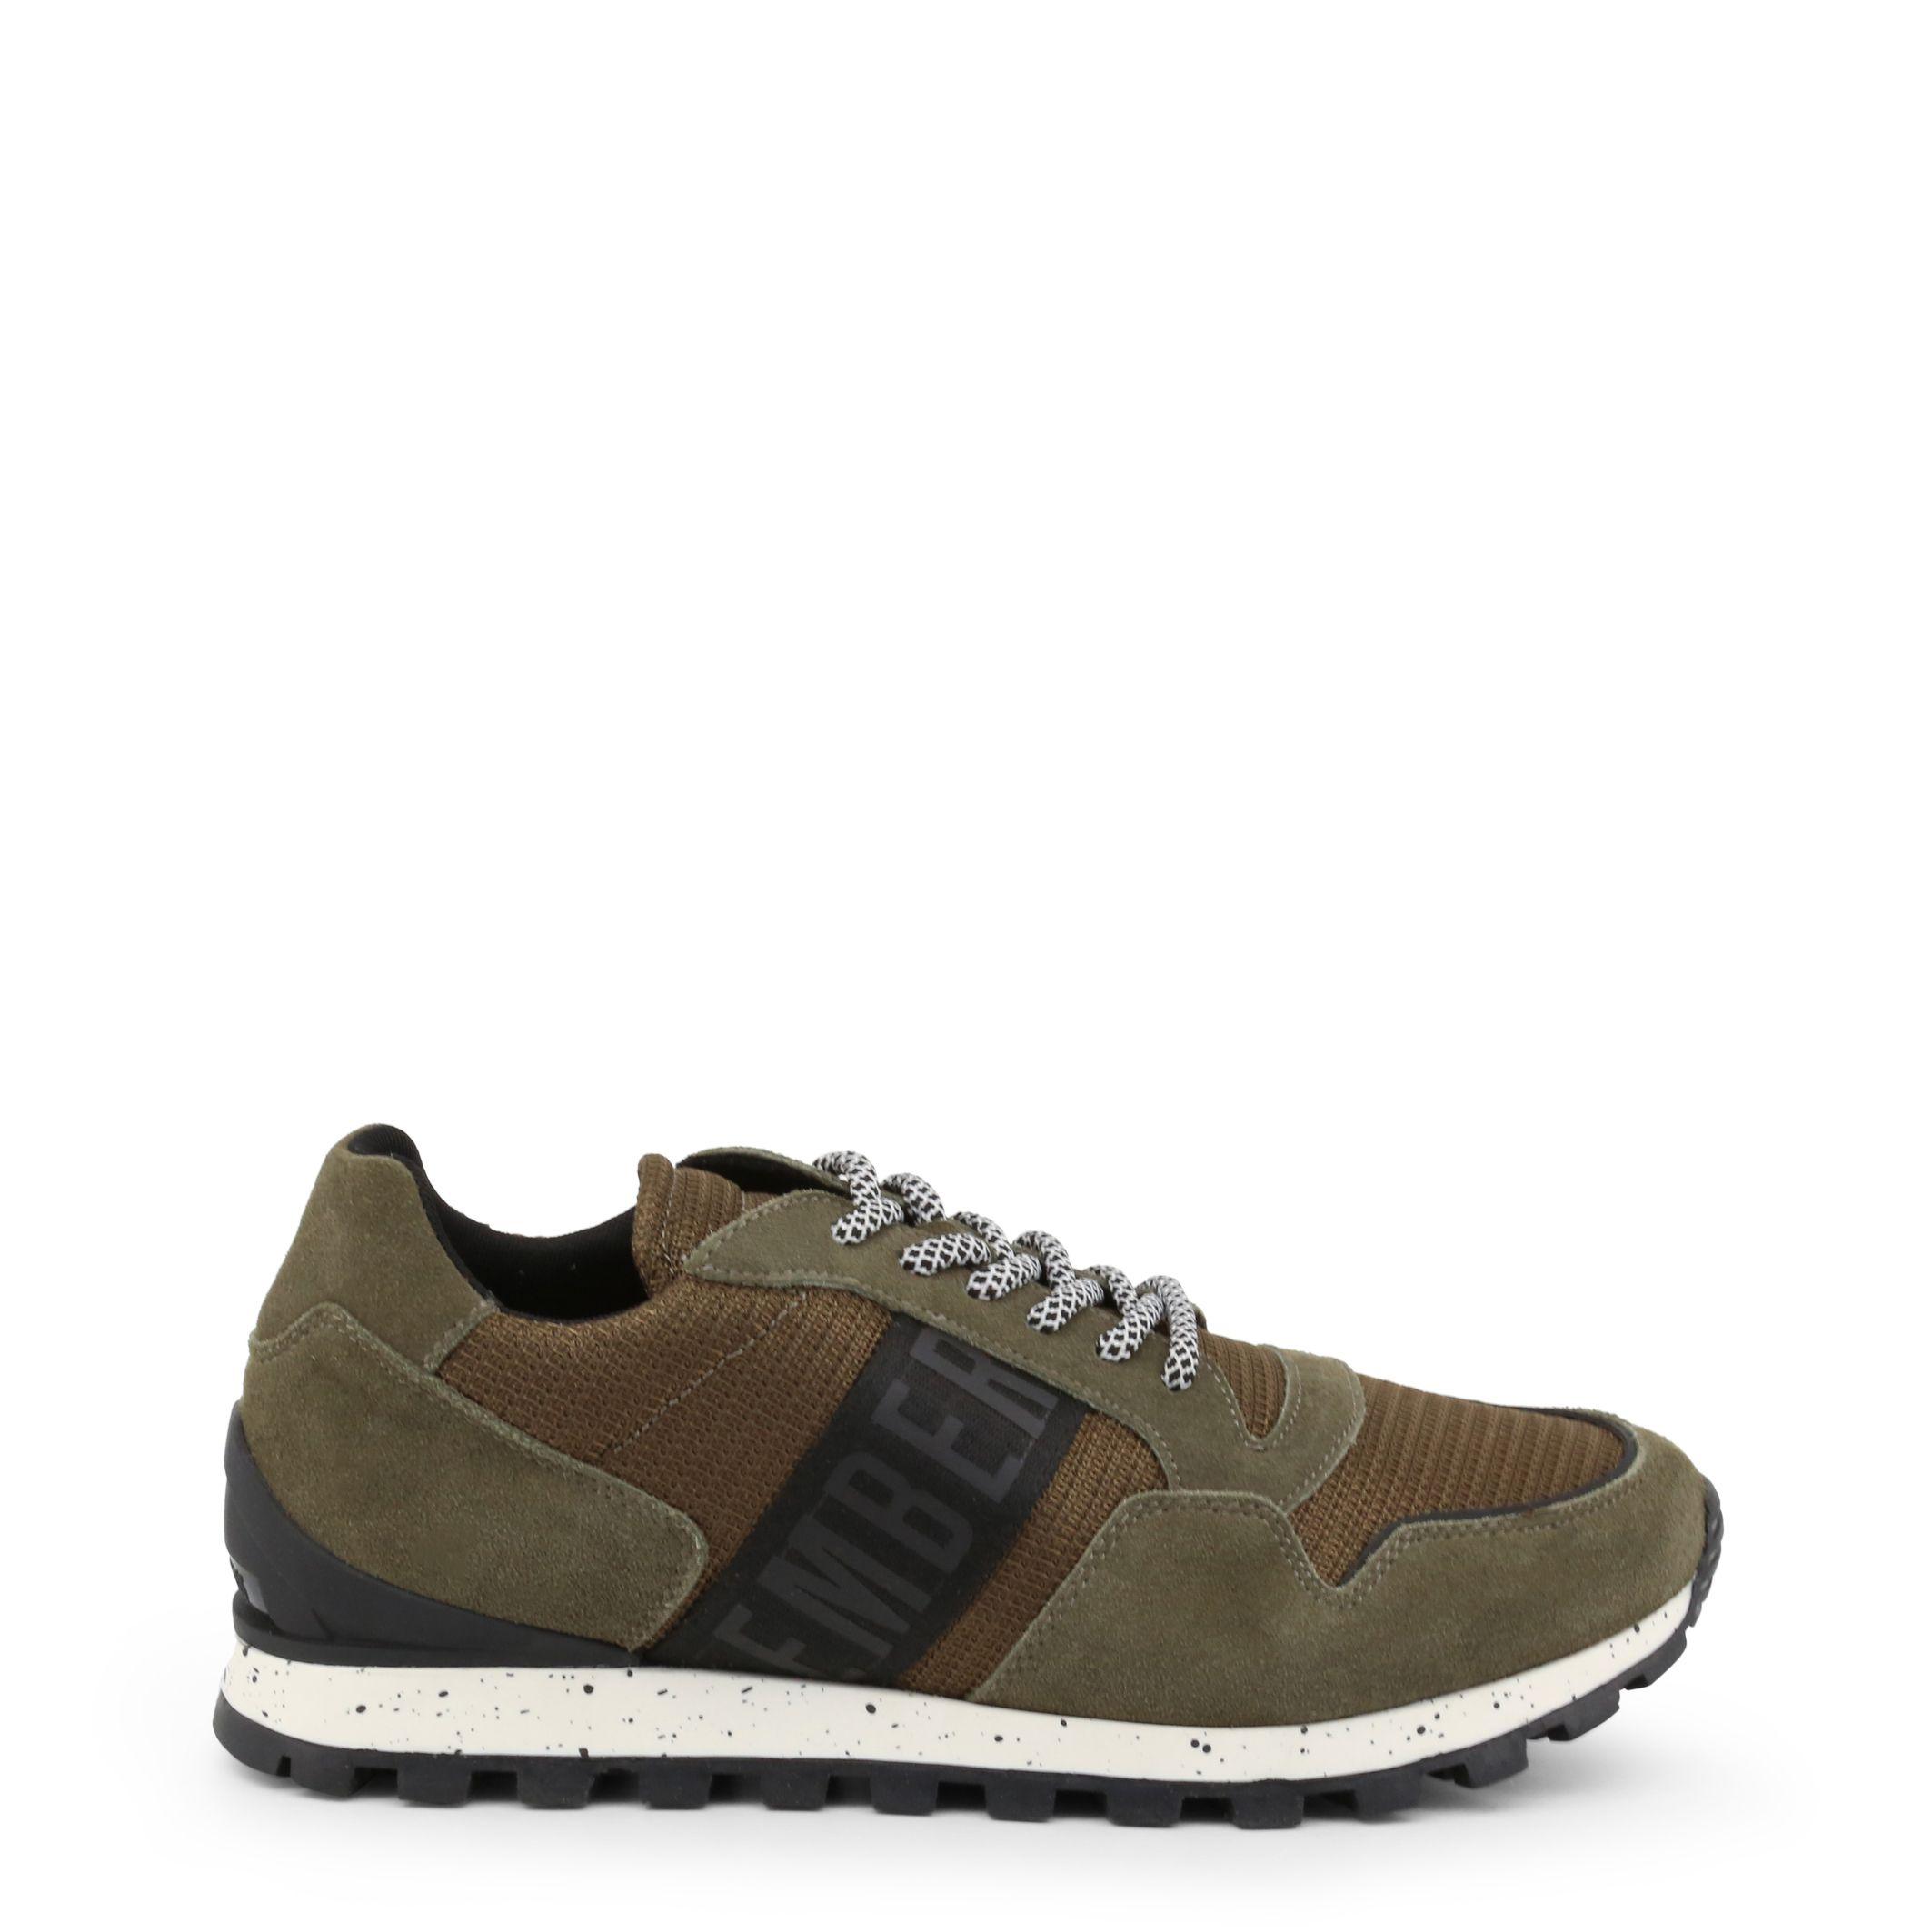 Bikkembergs Mens Sneakers